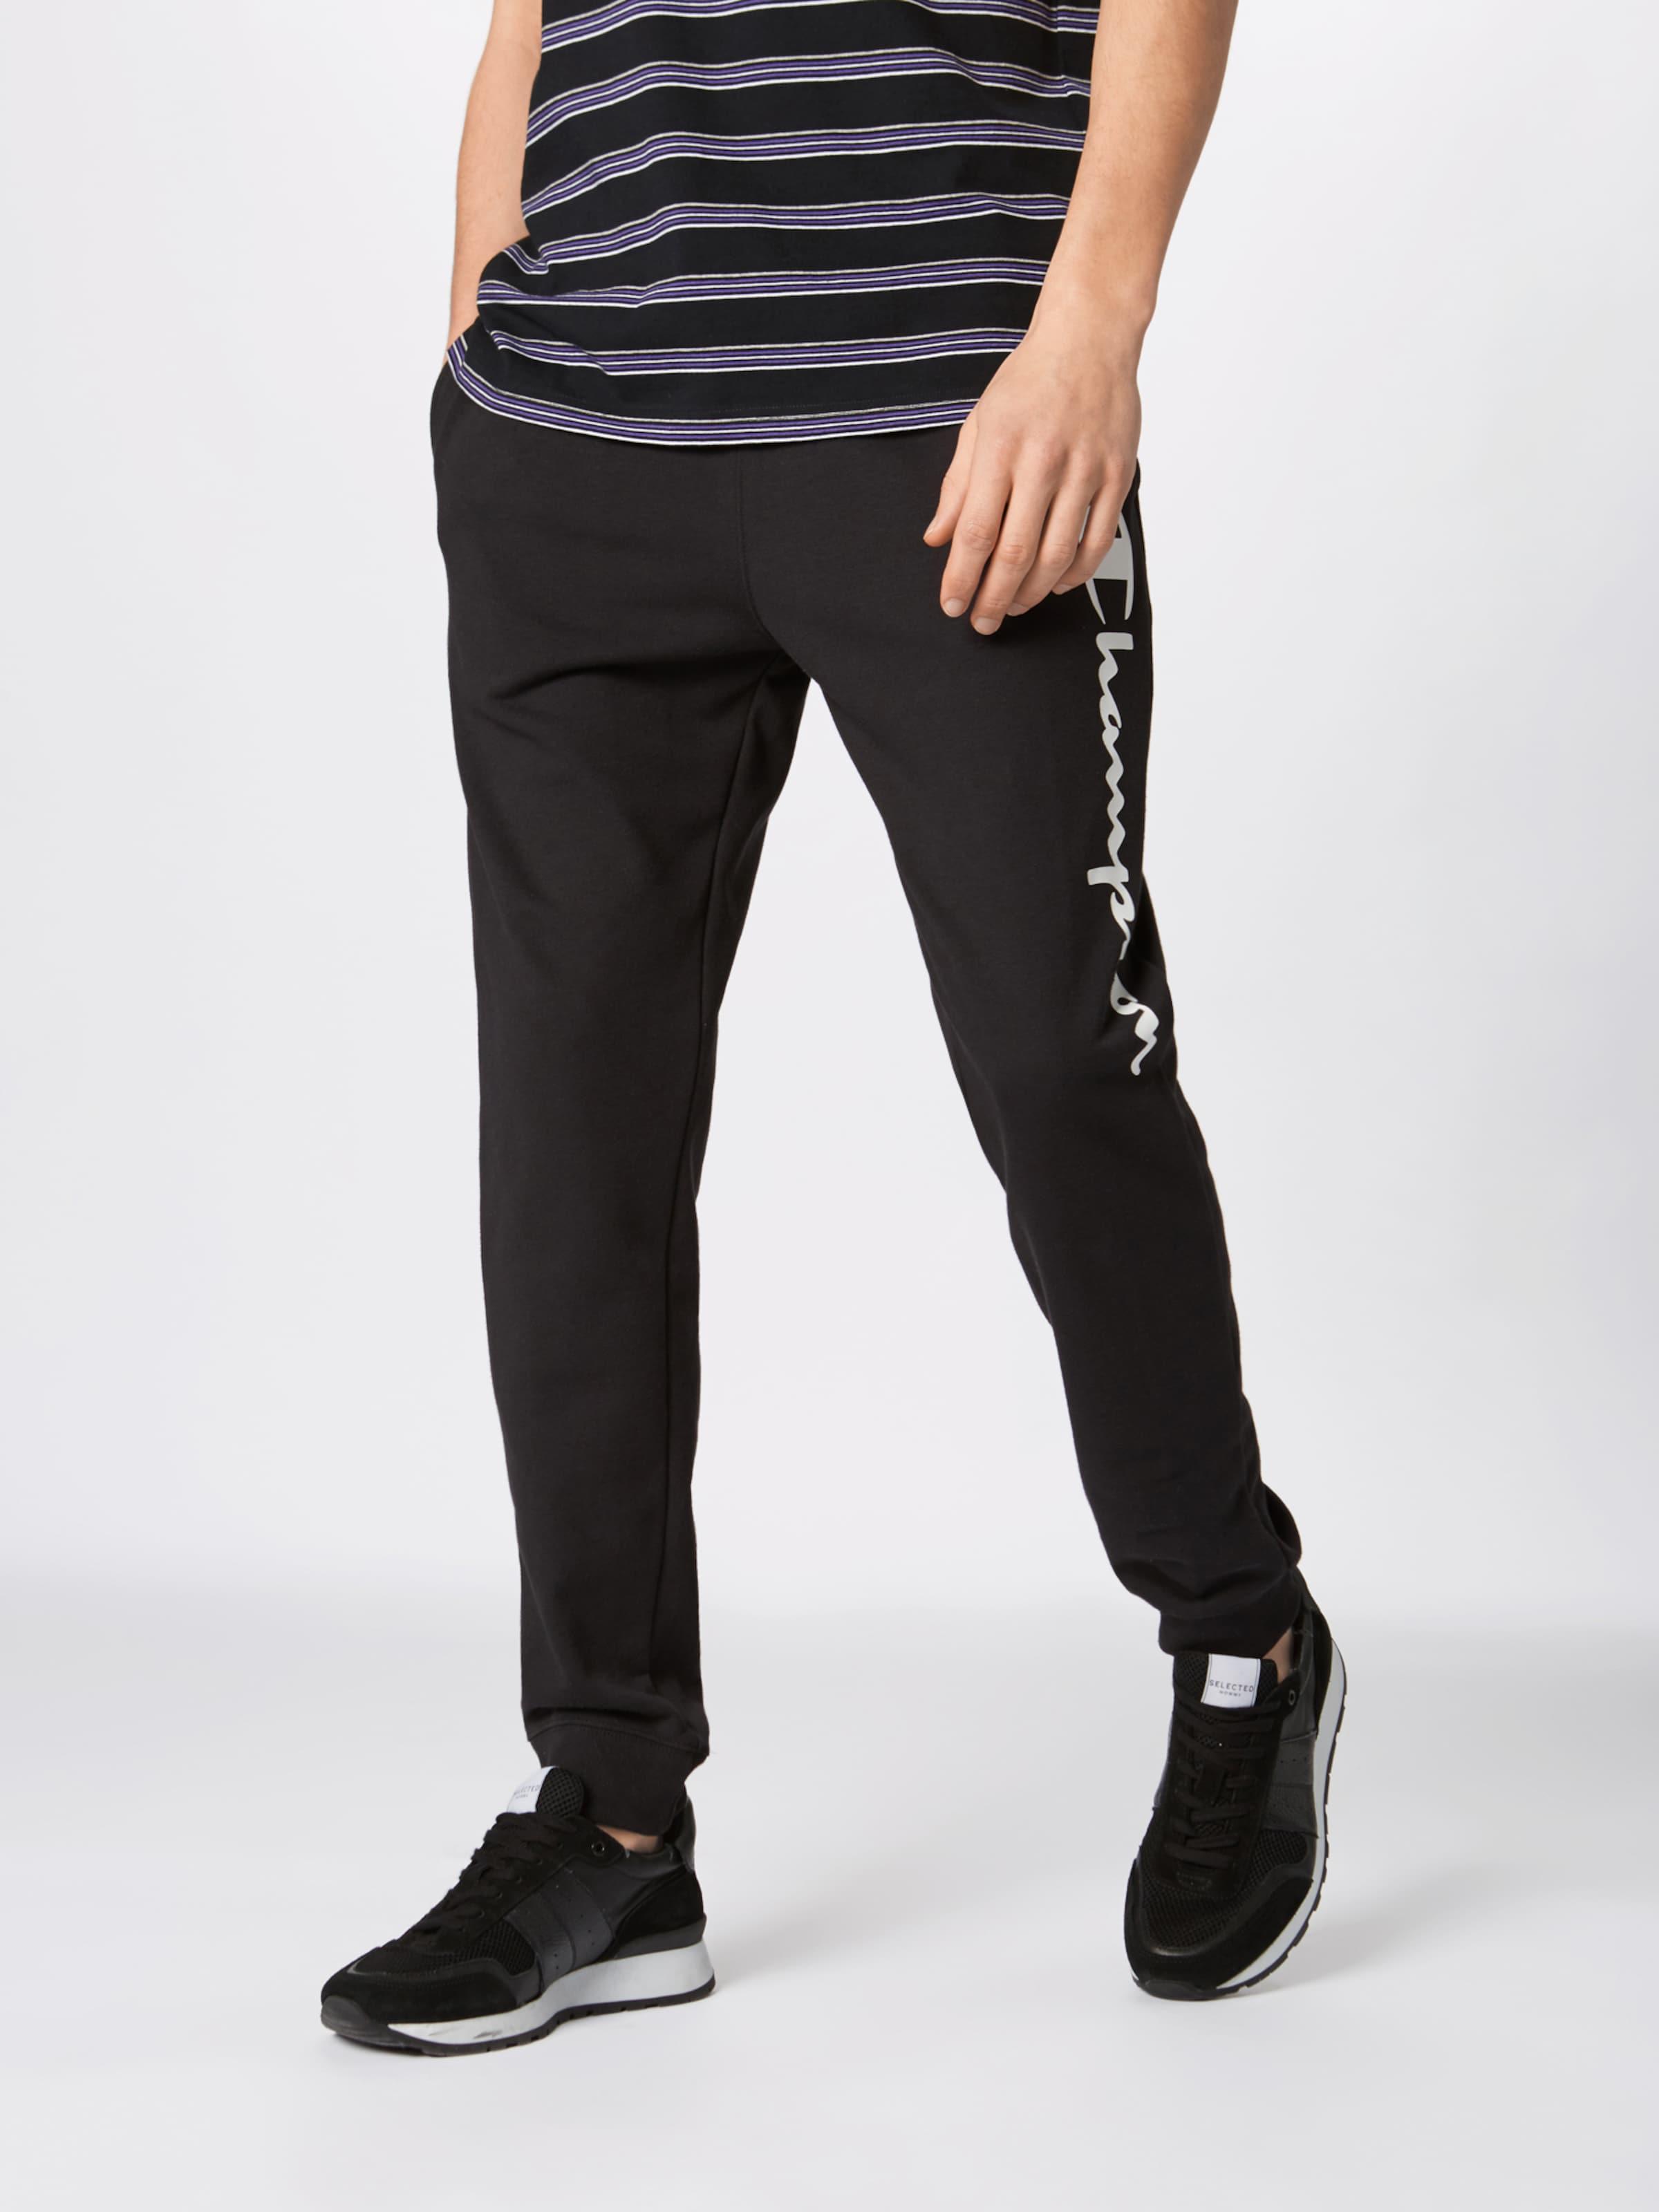 Pantalon Bleu En MarineBlanc Champion Apparel Authentic Athletic wnOPkX80